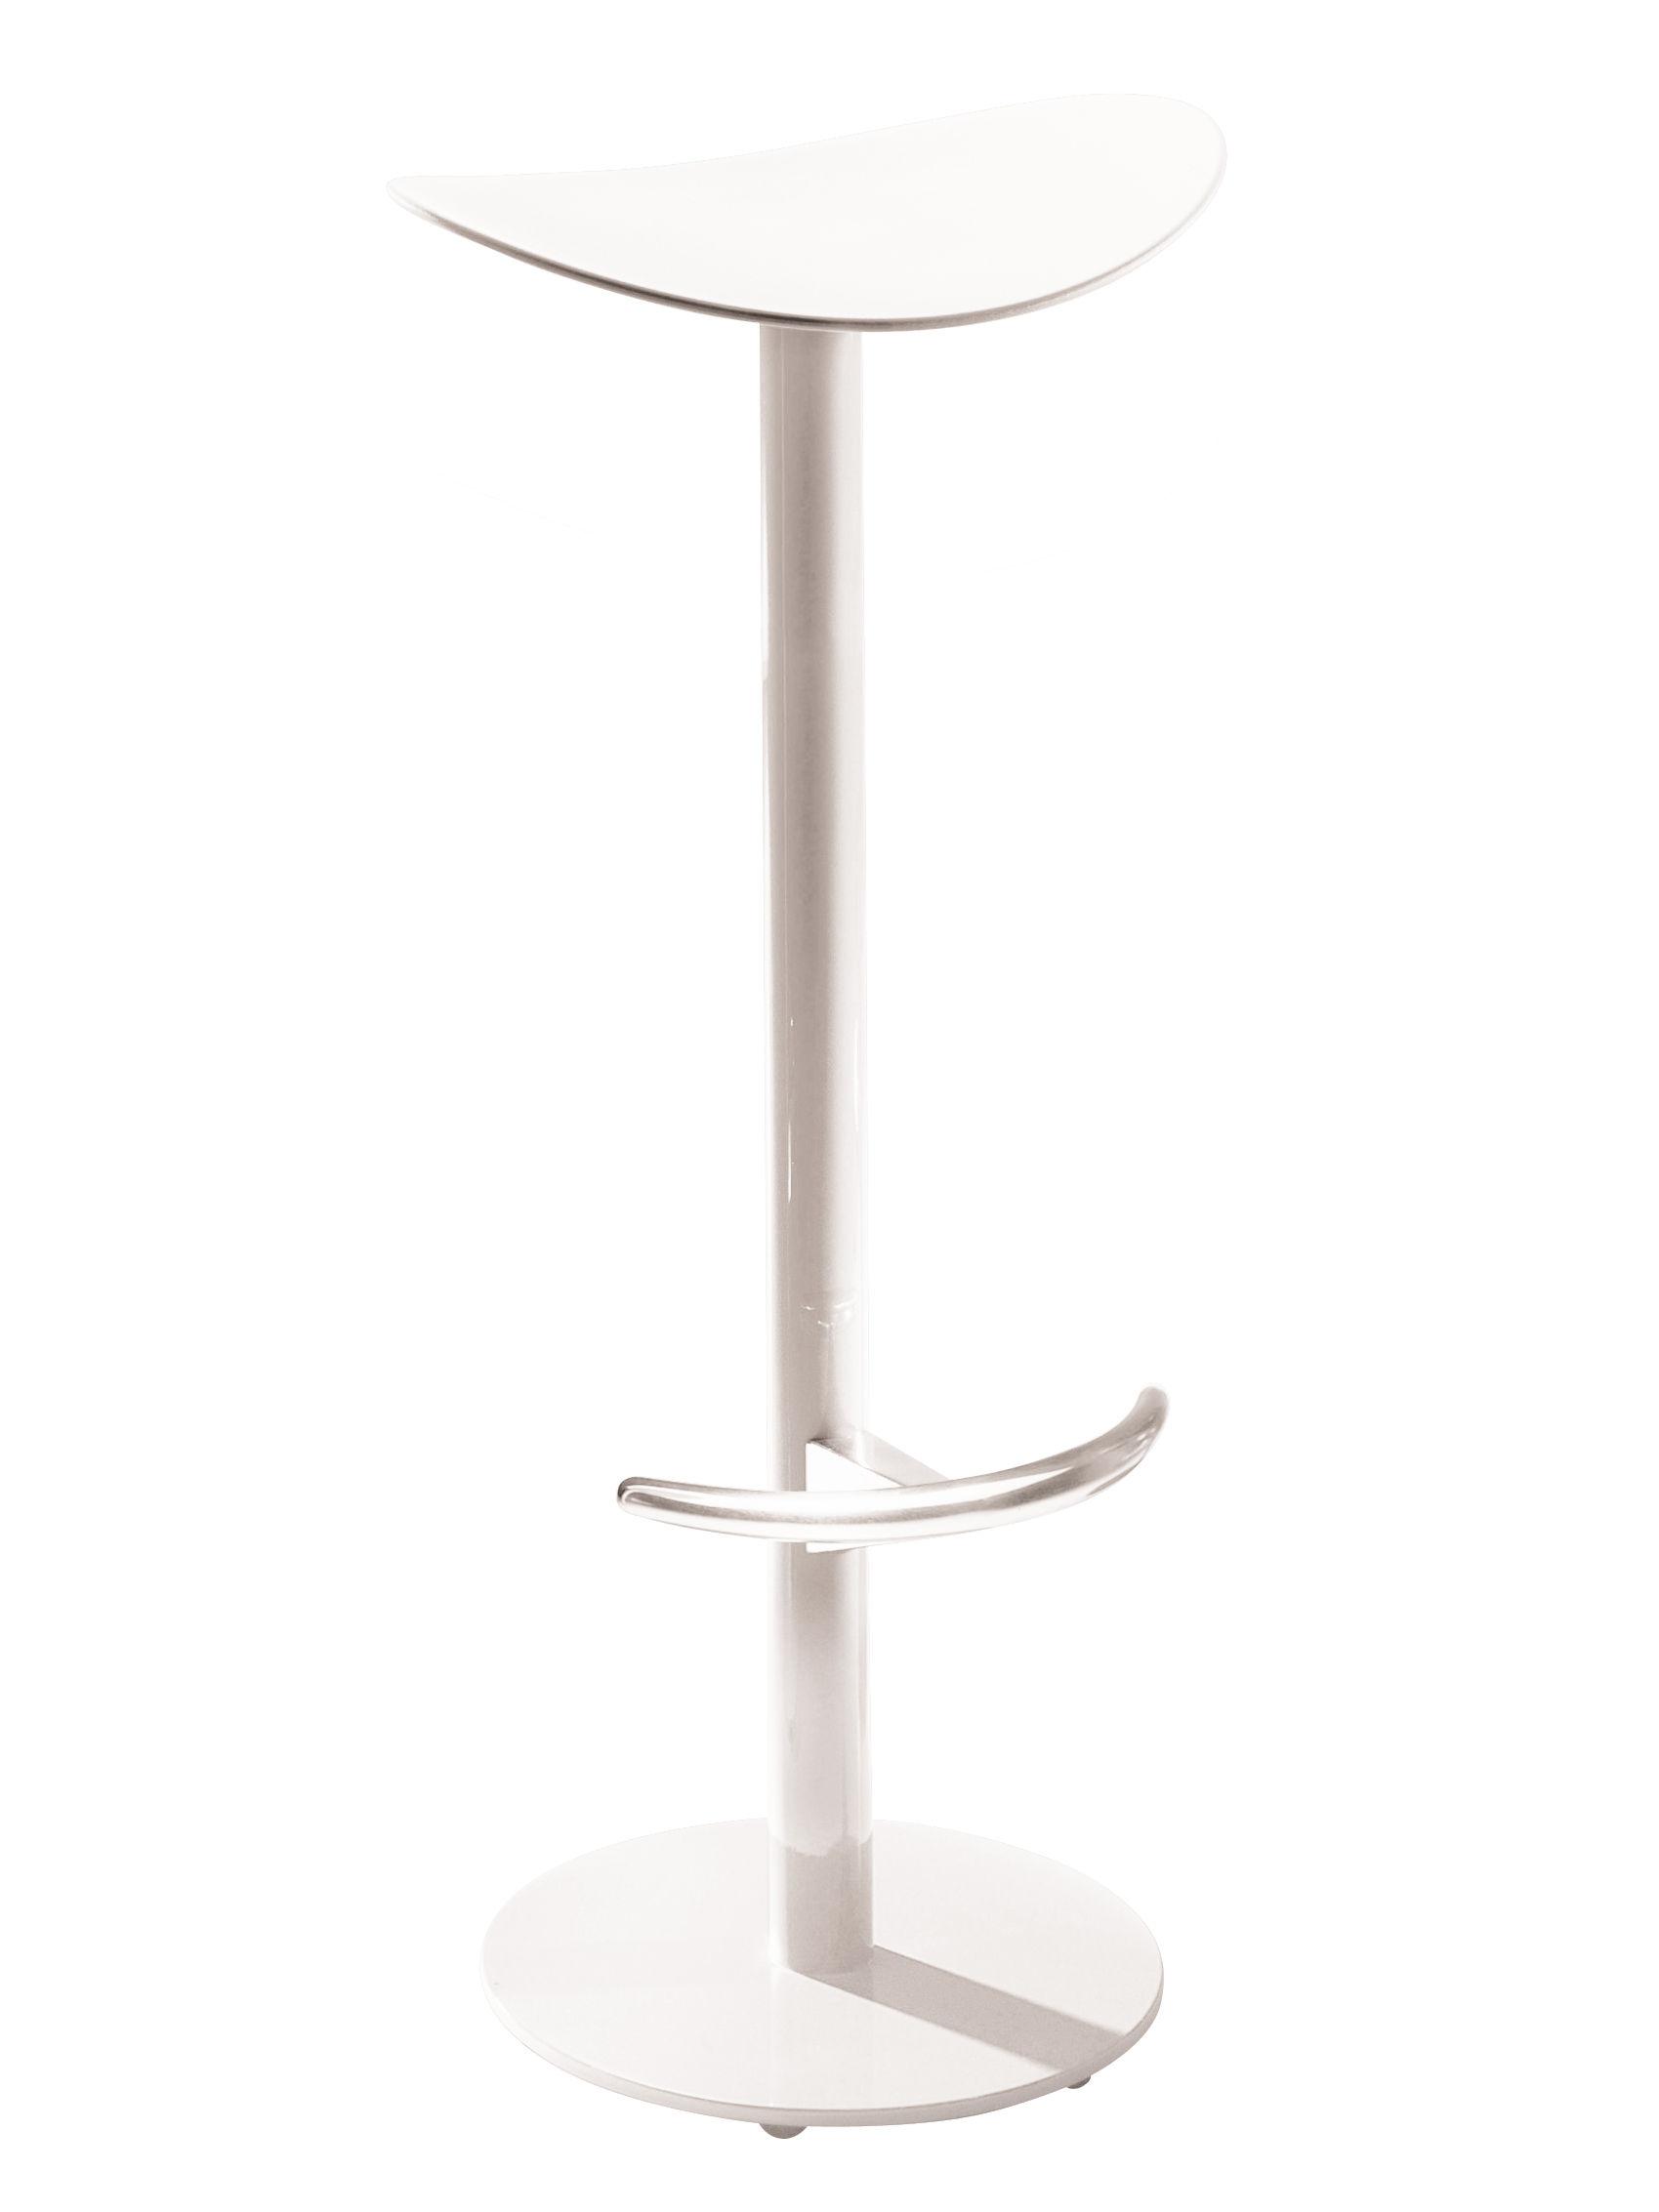 Möbel - Barhocker - Coma Barhocker H 79 cm - Enea - Weiß - lackierter Stahl, Polypropylen